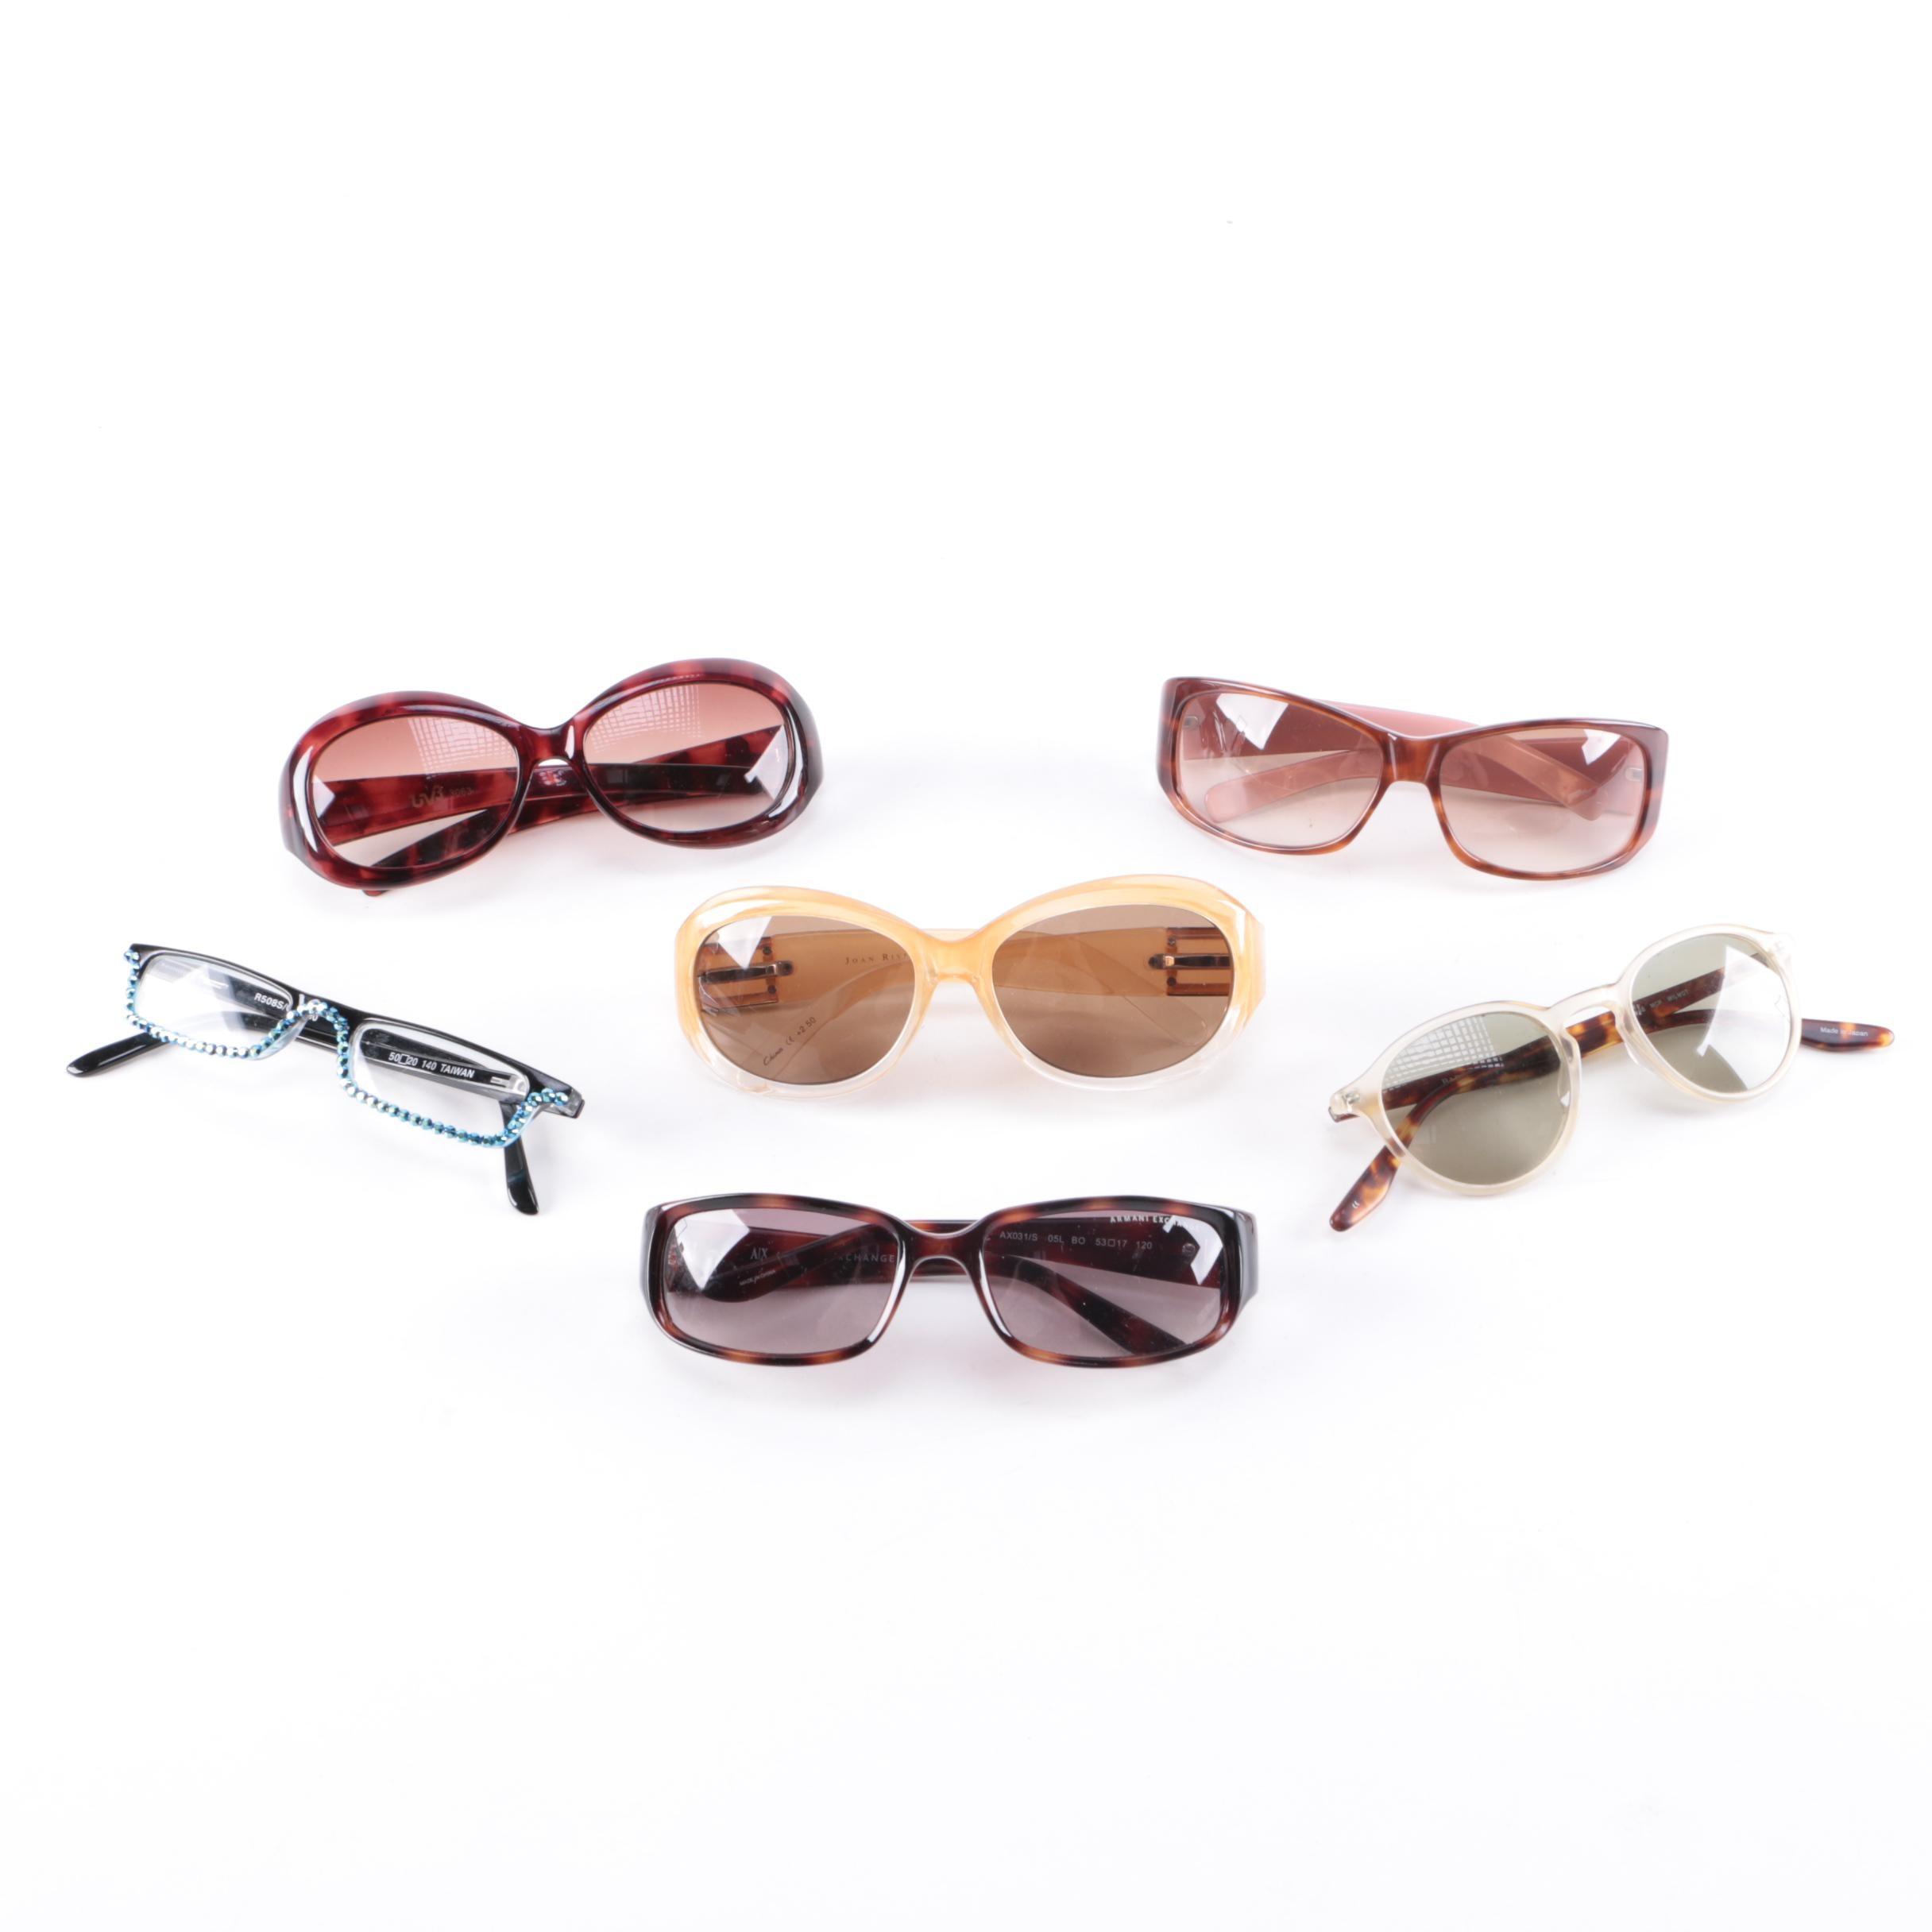 Assortment of Glasses Including Kate Spade